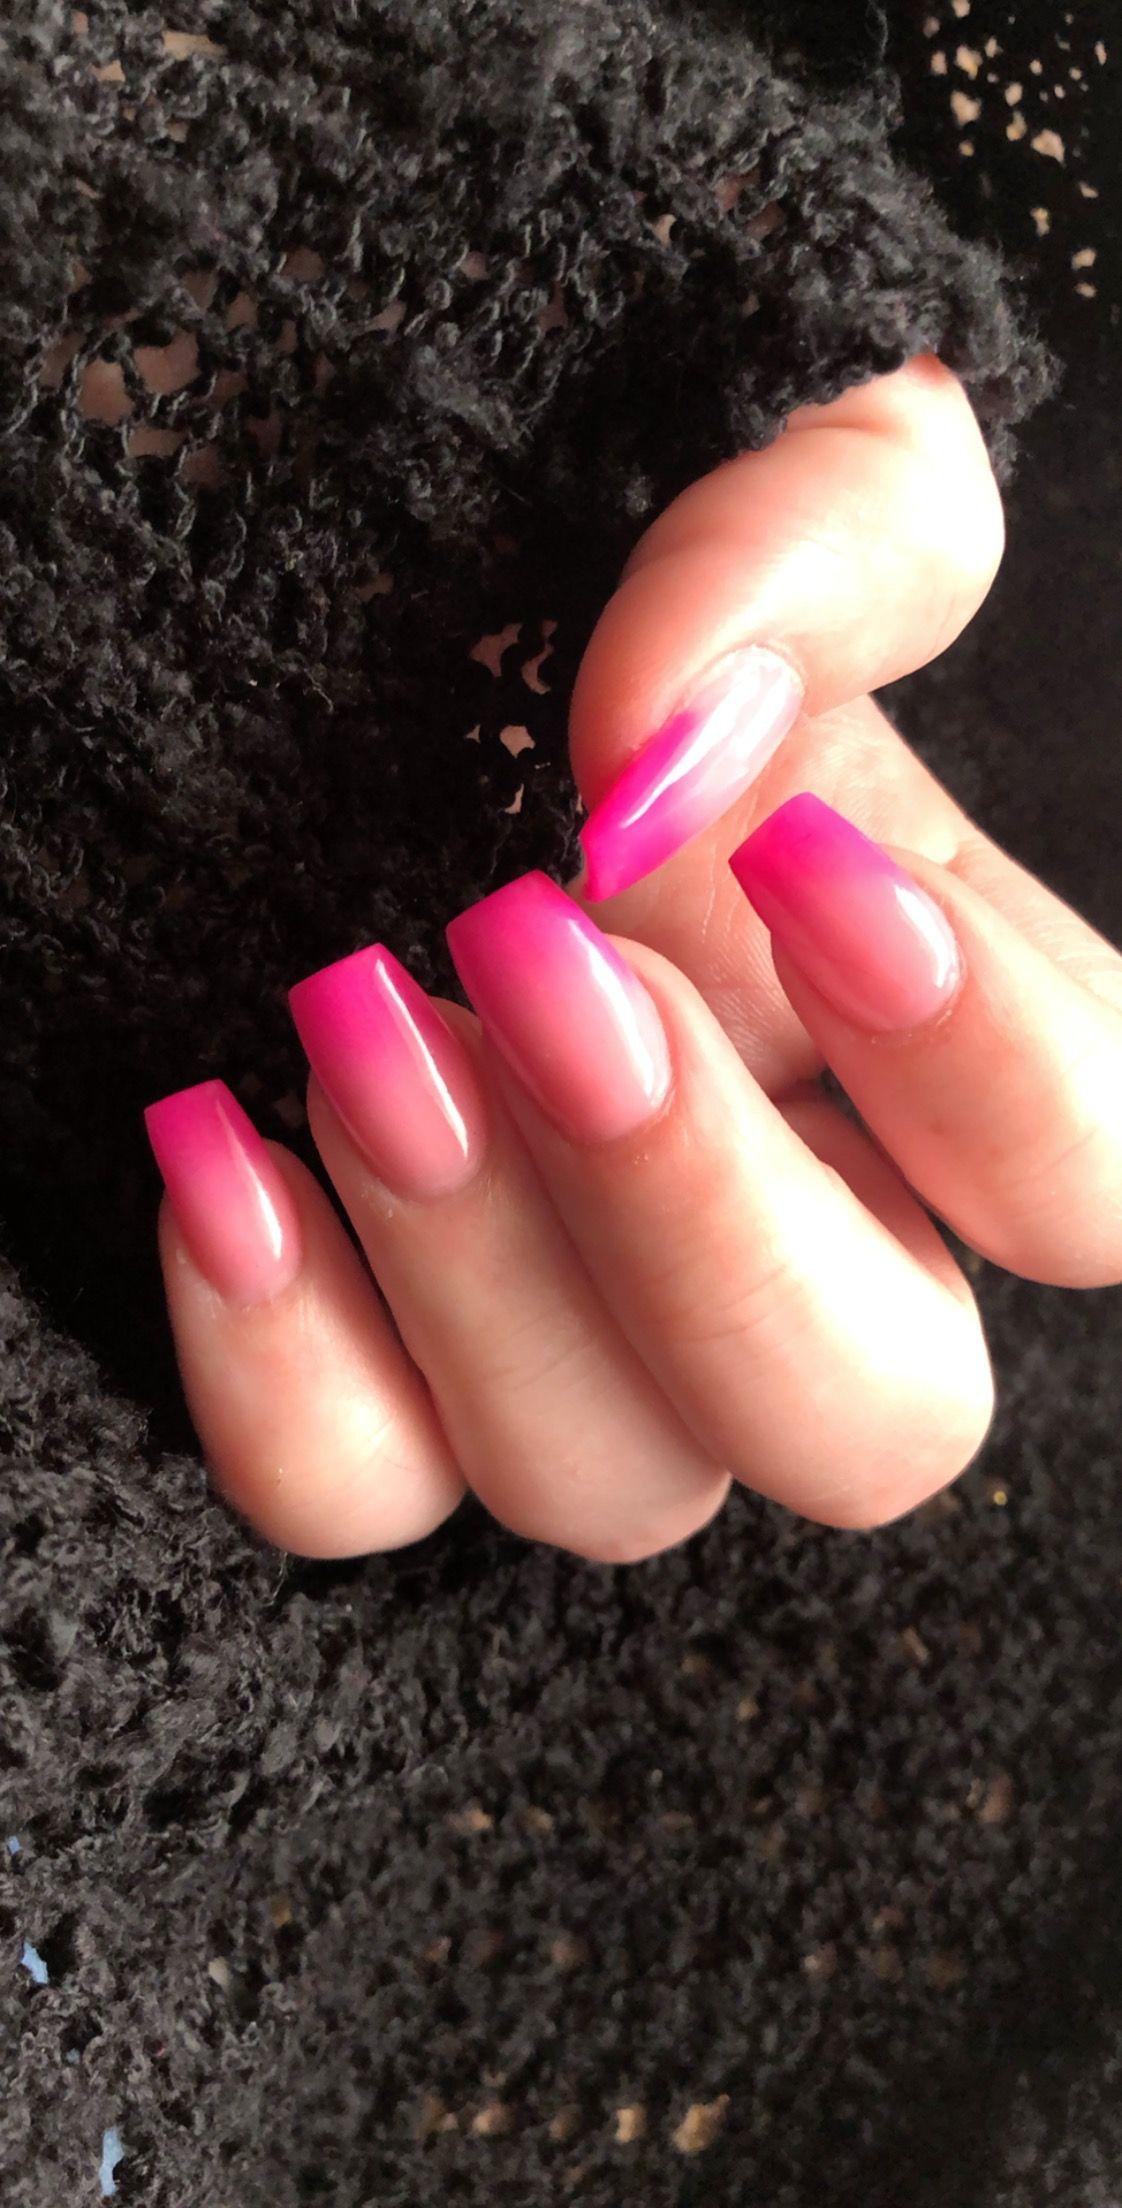 Ombre Acrylic Nails Pink Acrylic Nails Ombre Acrylic Nails Nail Designs Hot Pink